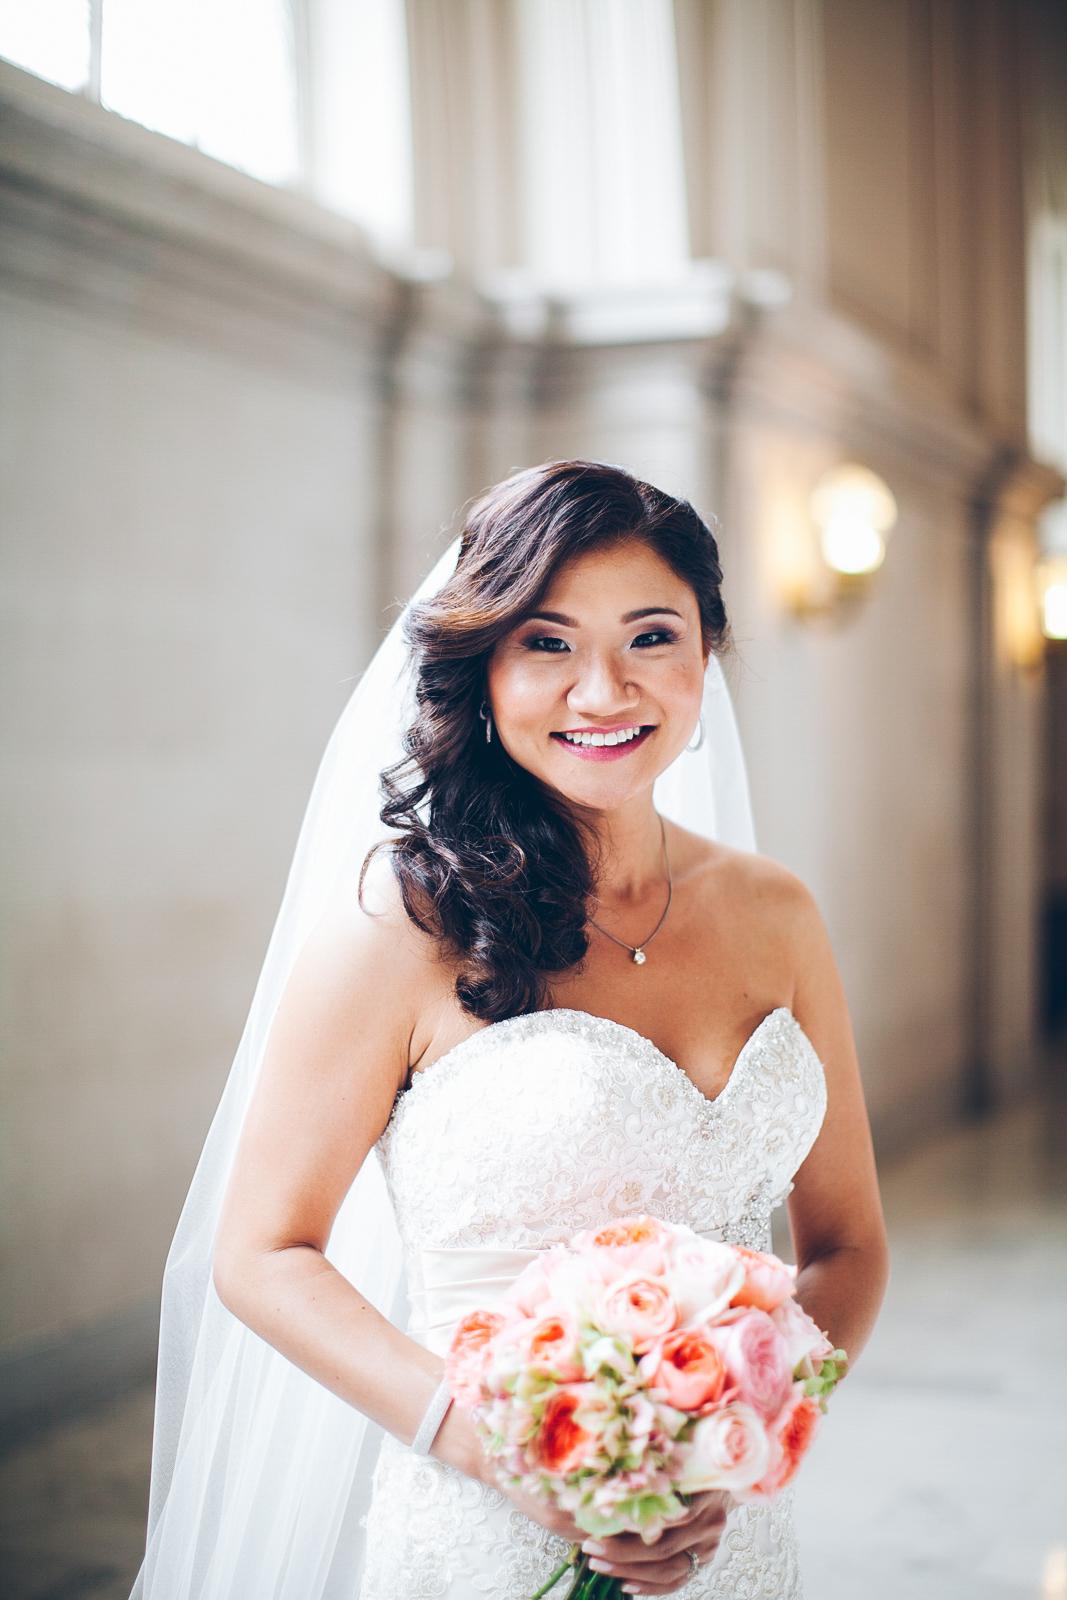 San_francisco_city_hall_wedding_photography_meegan_travis_ebony_siovhan_bokeh_photography_39.jpg